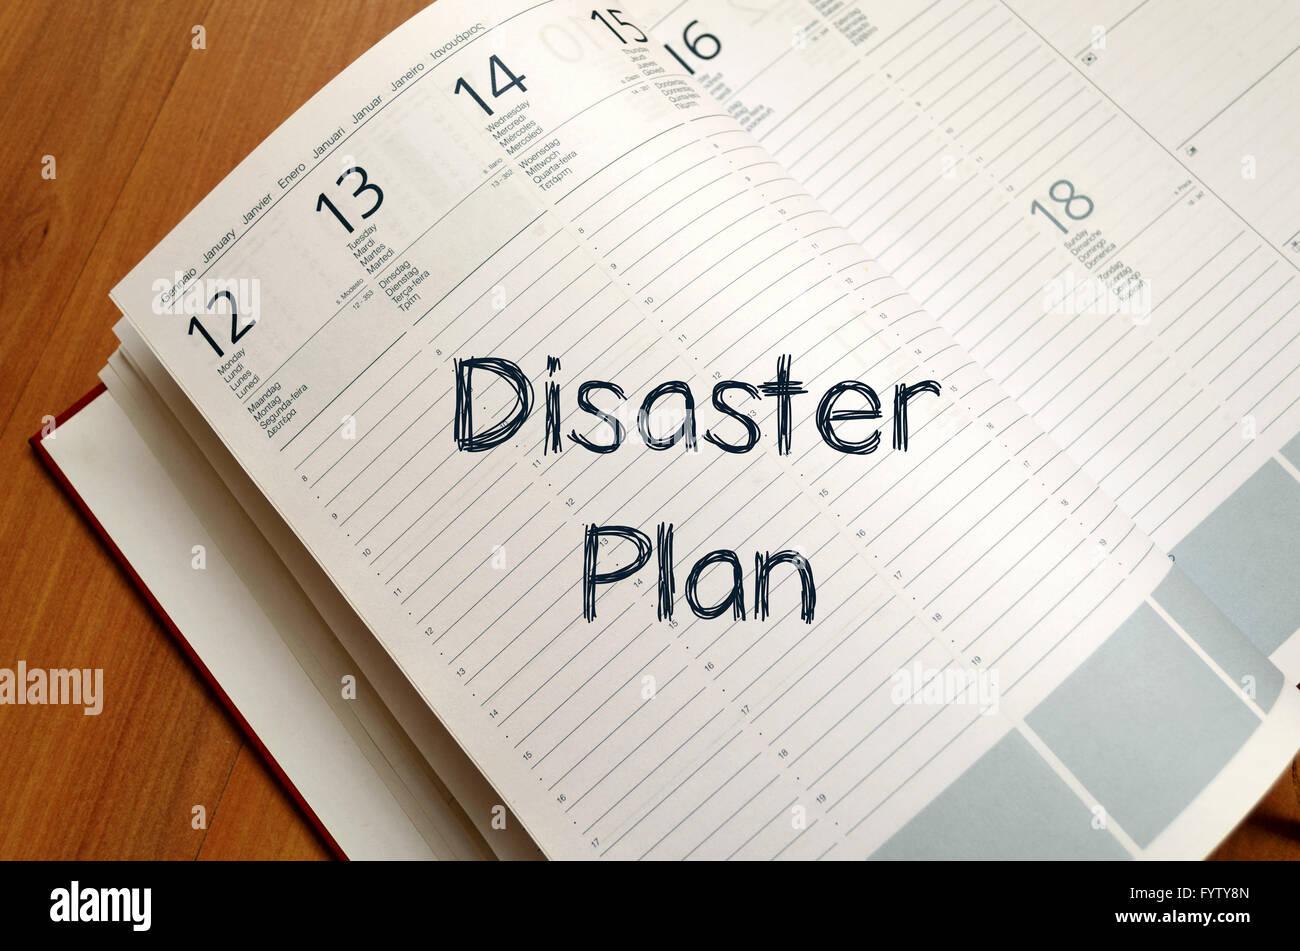 Disaster plan write on notebook - Stock Image